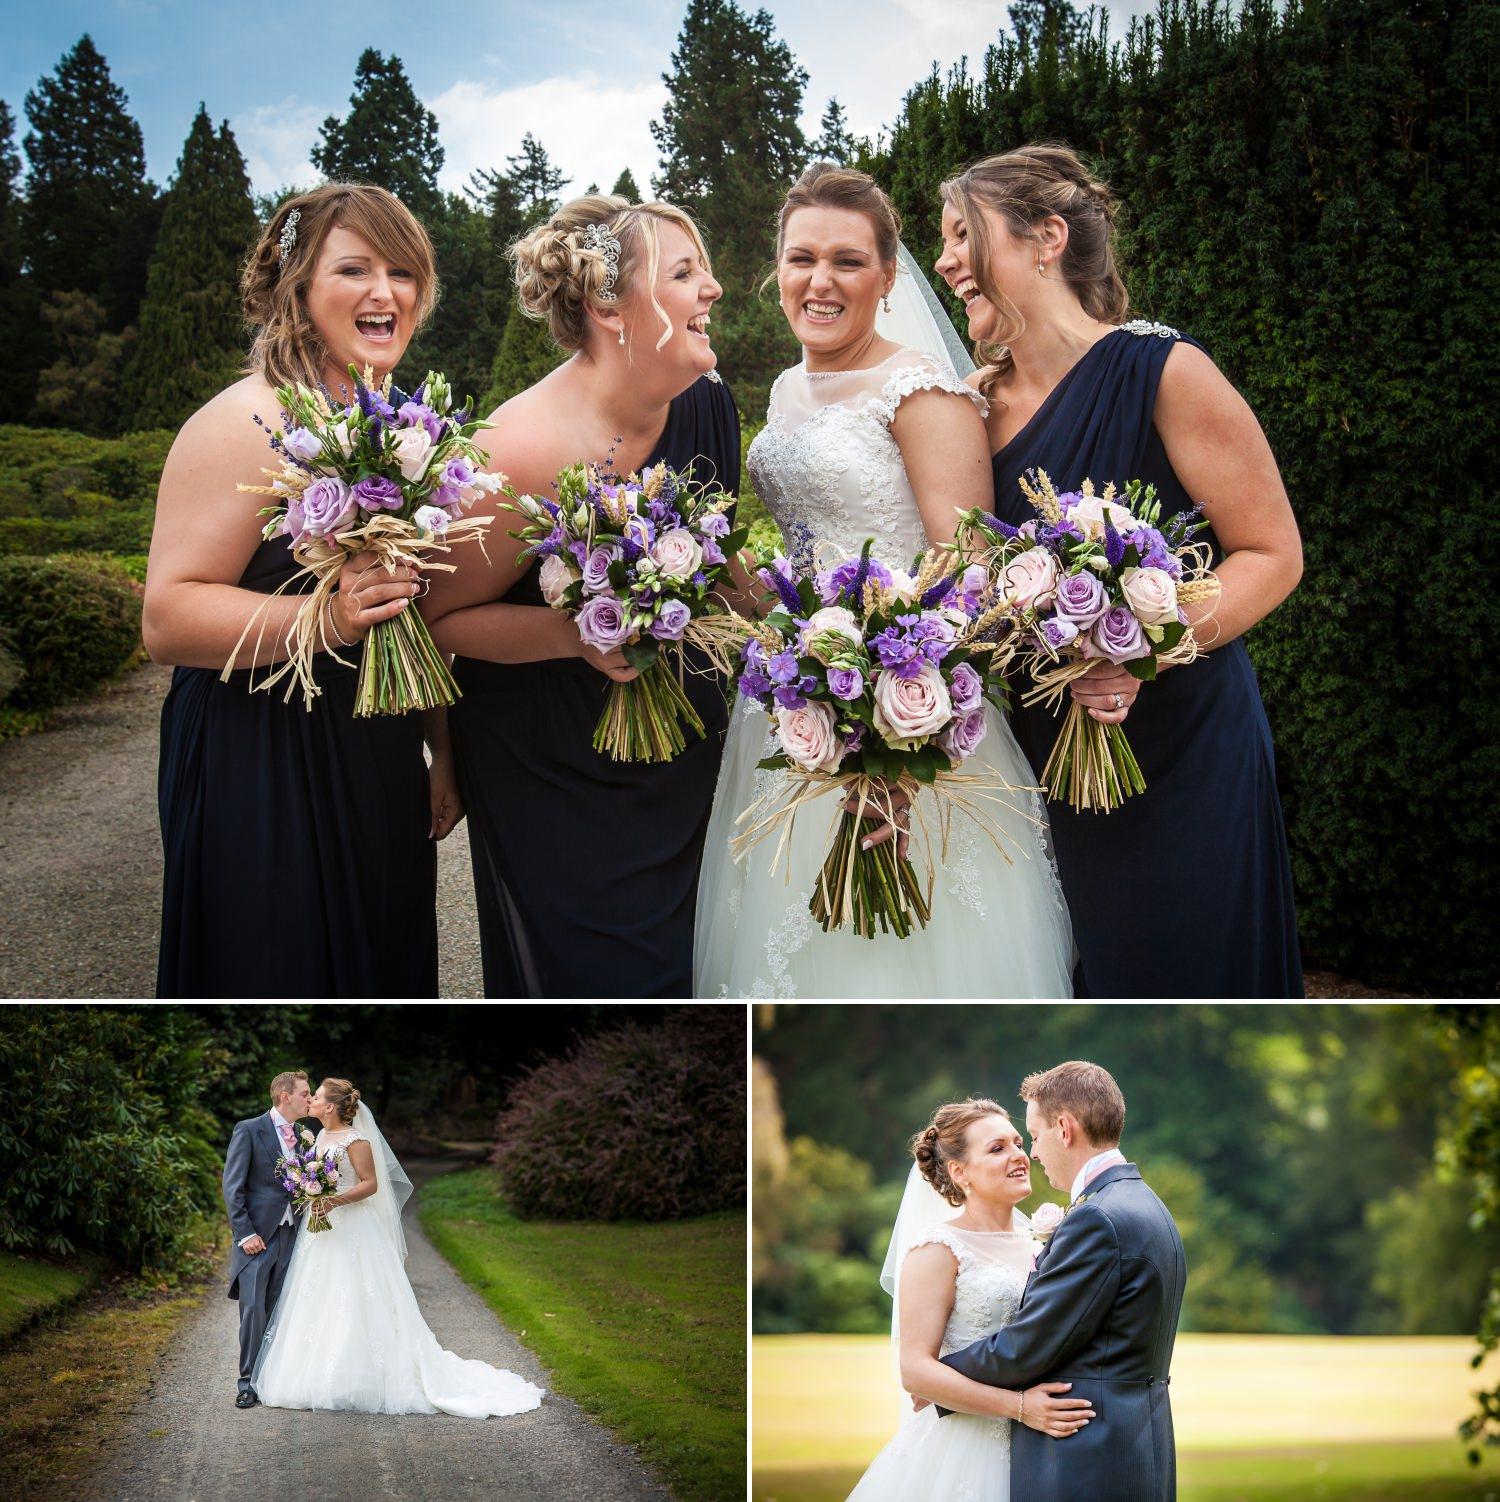 Wedding Photography Wales photograph of bridesmaids